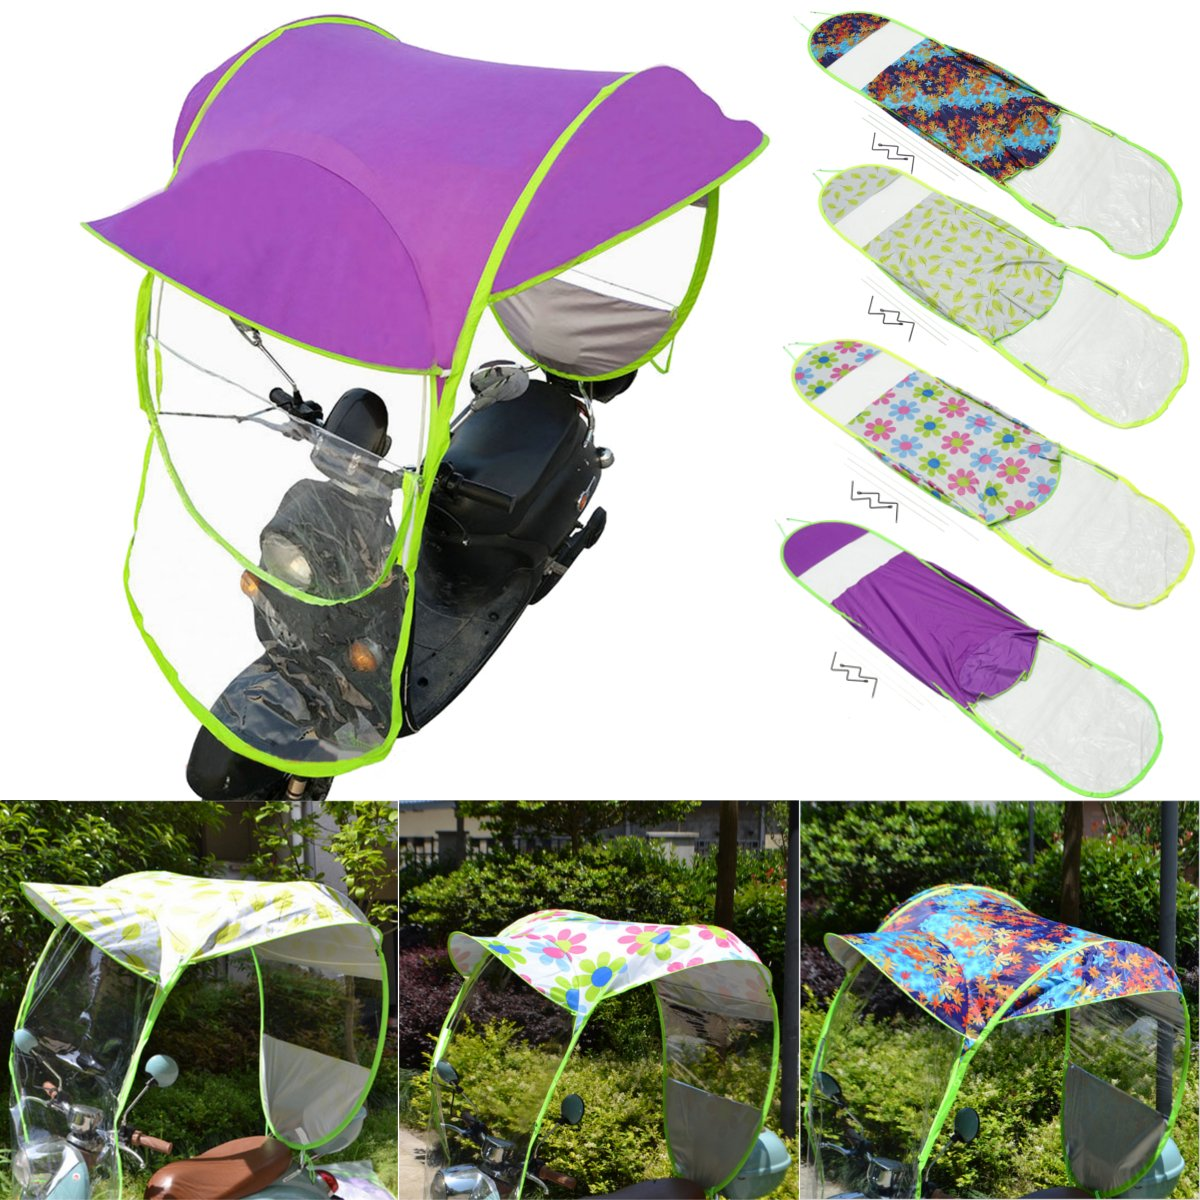 Amazon.com: Automotive Universal Motor Scooter Umbrella Mobility Sunshade & Rain Cover Waterproof - (NO.: 03#): Cell Phones & Accessories